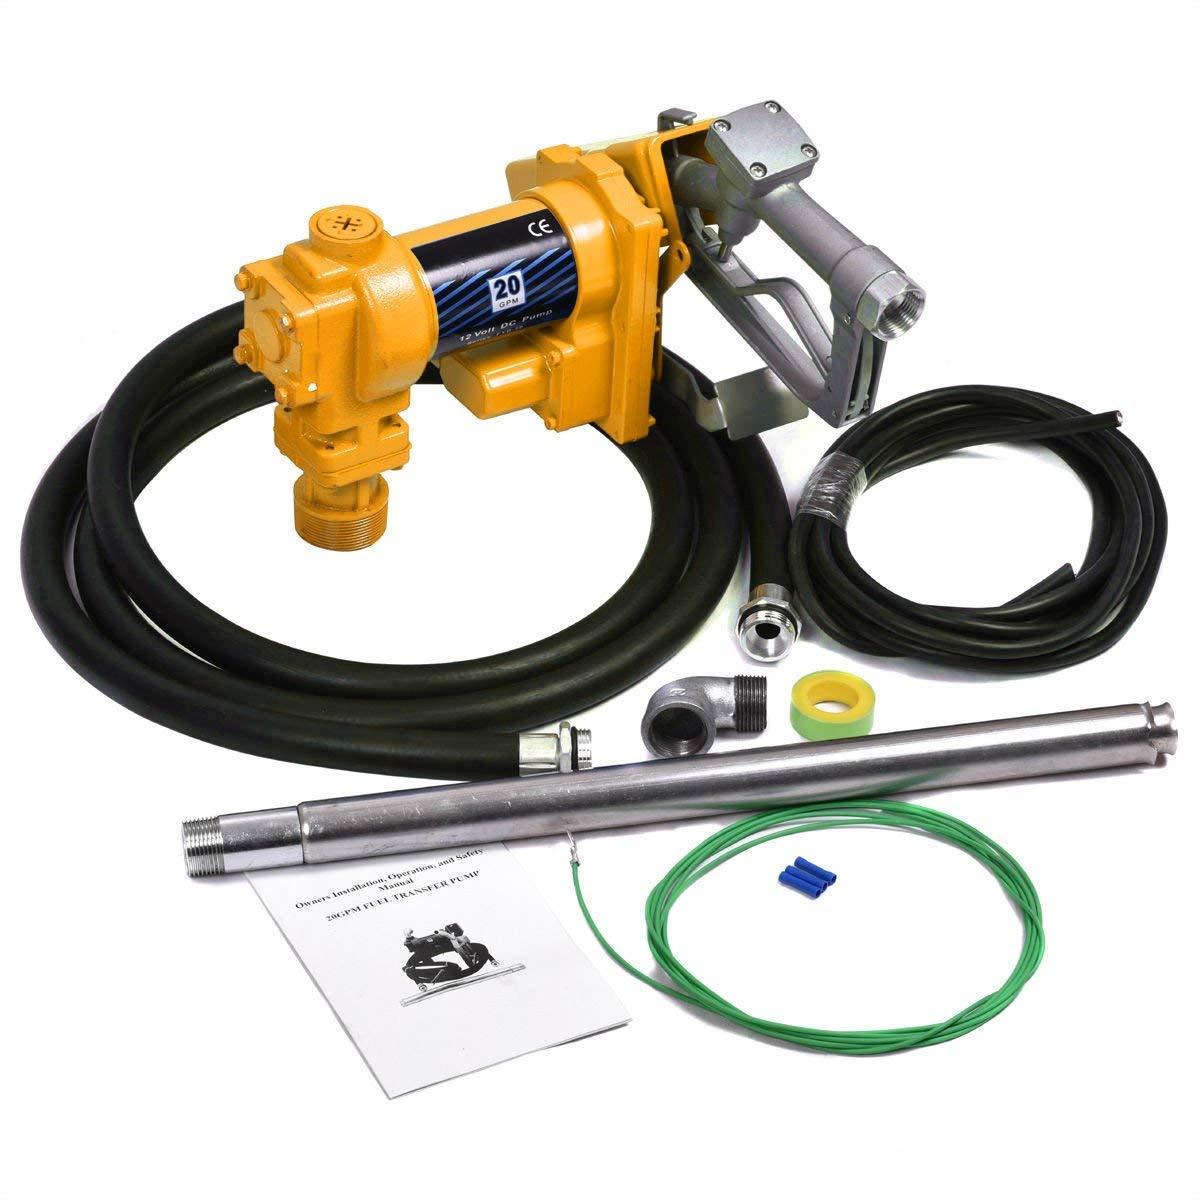 JAXPETY Gasoline Fuel Transfer Pump 12 Volt DC 20GPM Gas Diesel Kerosene Nozzle Kit by JAXPETY